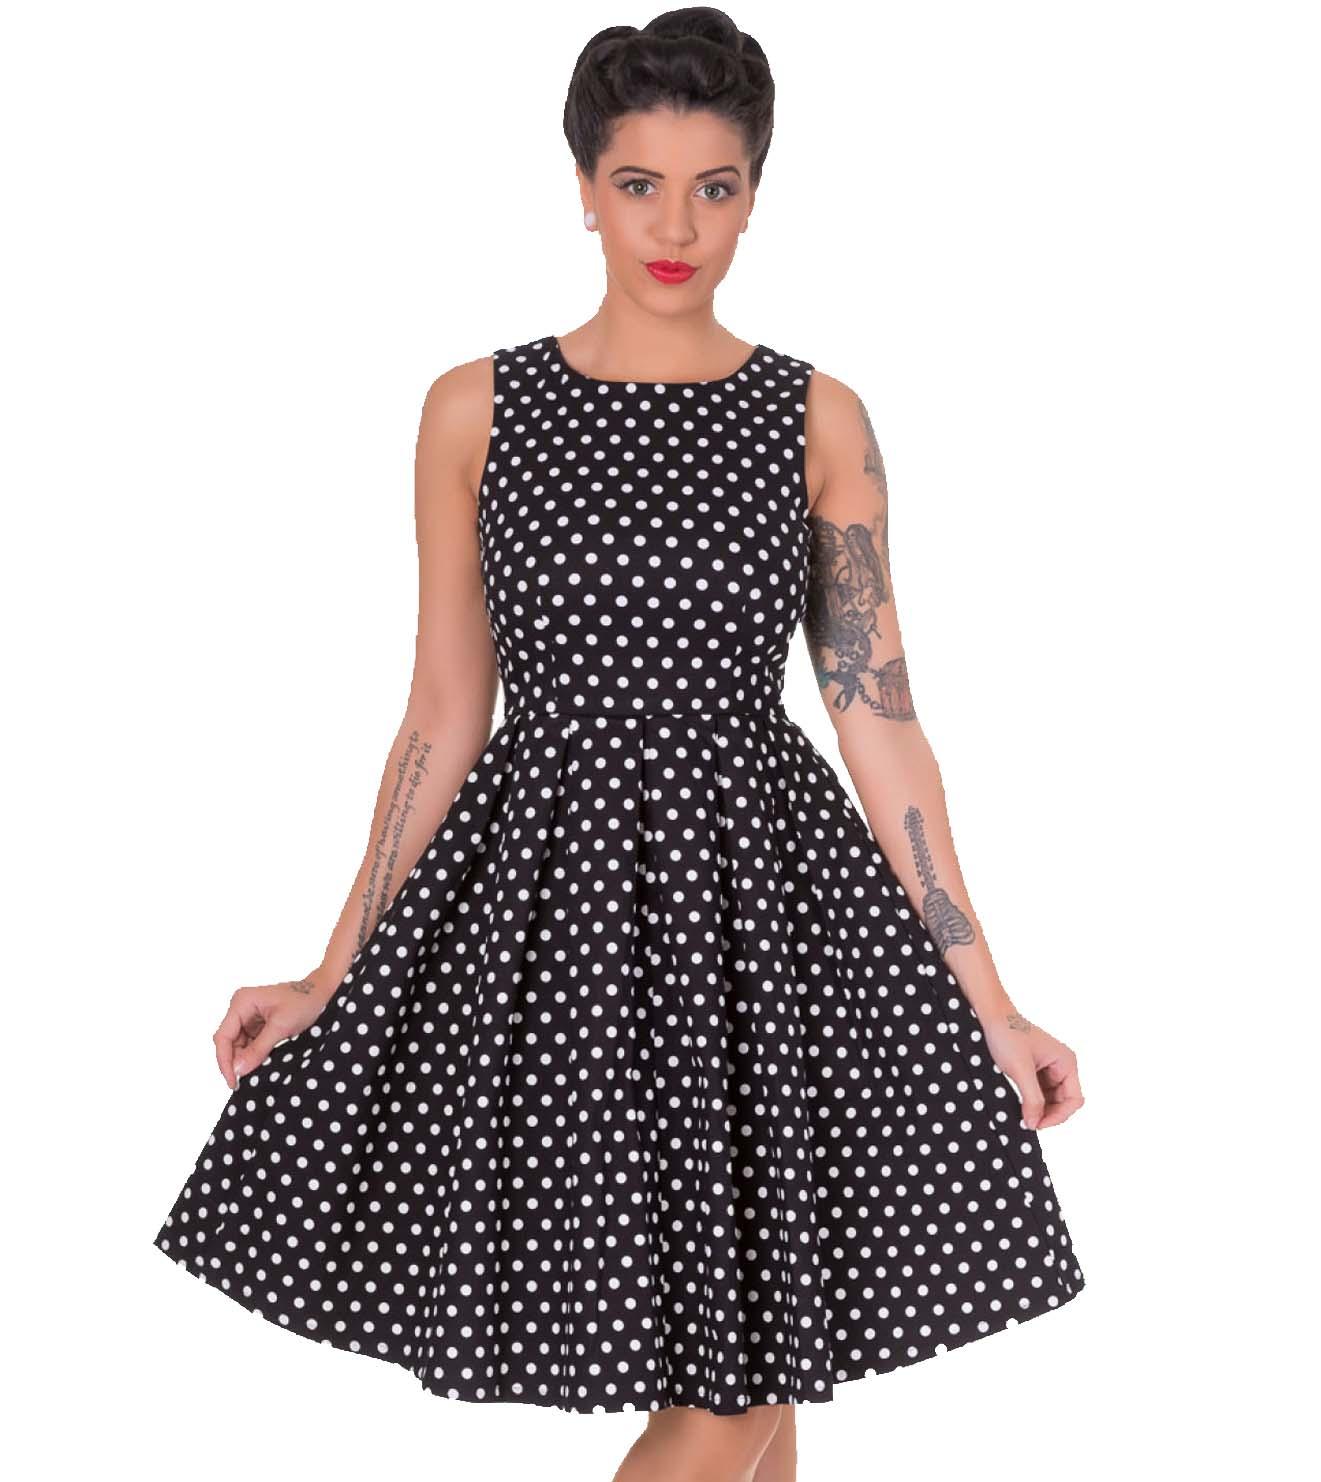 vintage pin up 50s polka dot φόρεμα Lola σε μαύρο 59a997d5783